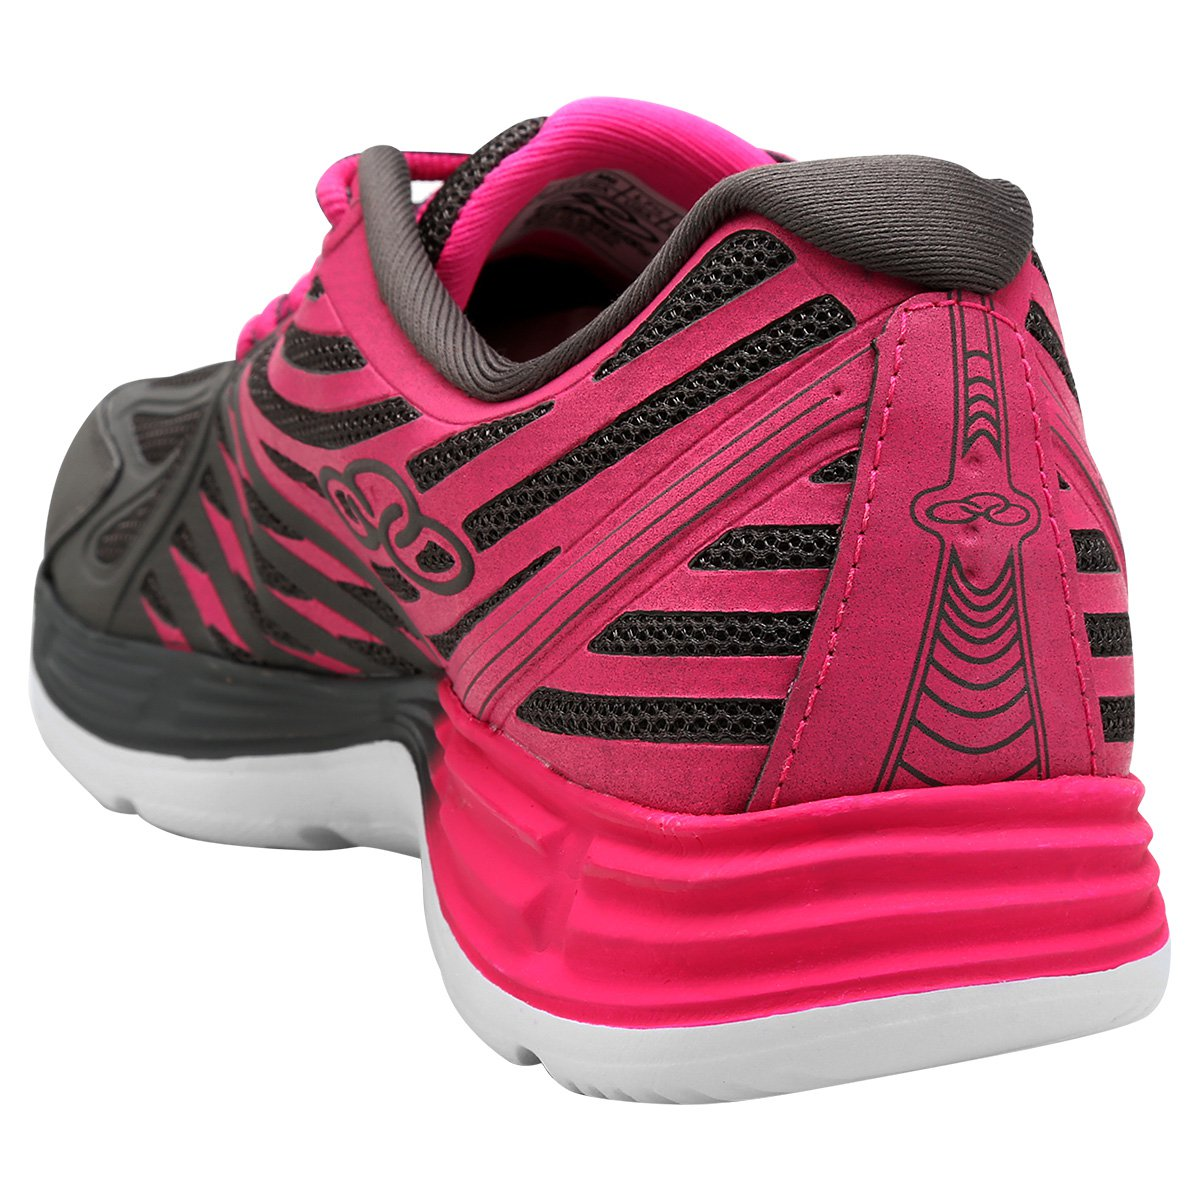 Tênis Olympikus Flix 2 Feminino - Chumbo e Pink - Compre Agora ... 8b0afc71ae06b